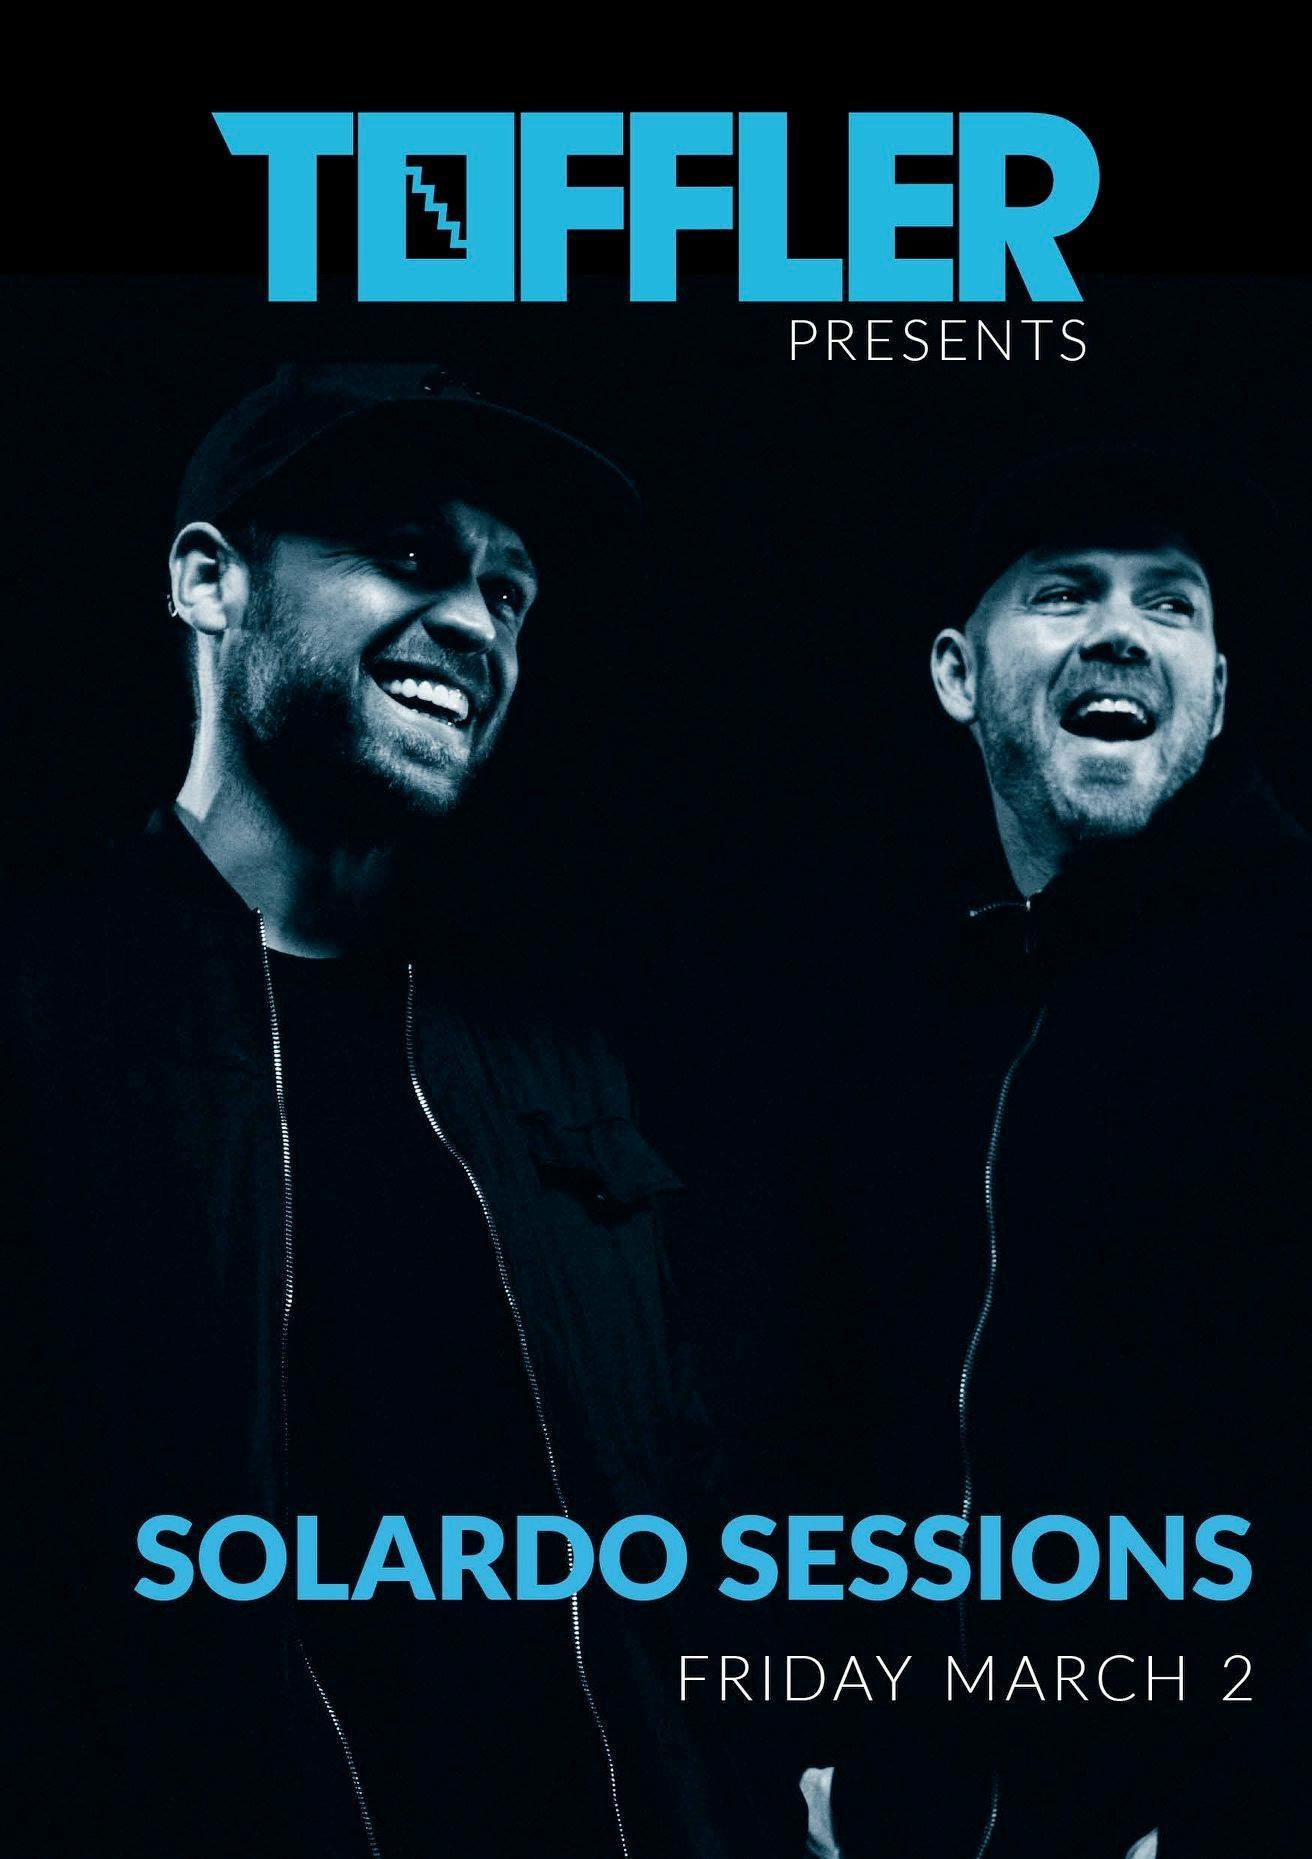 Solardo Sessions